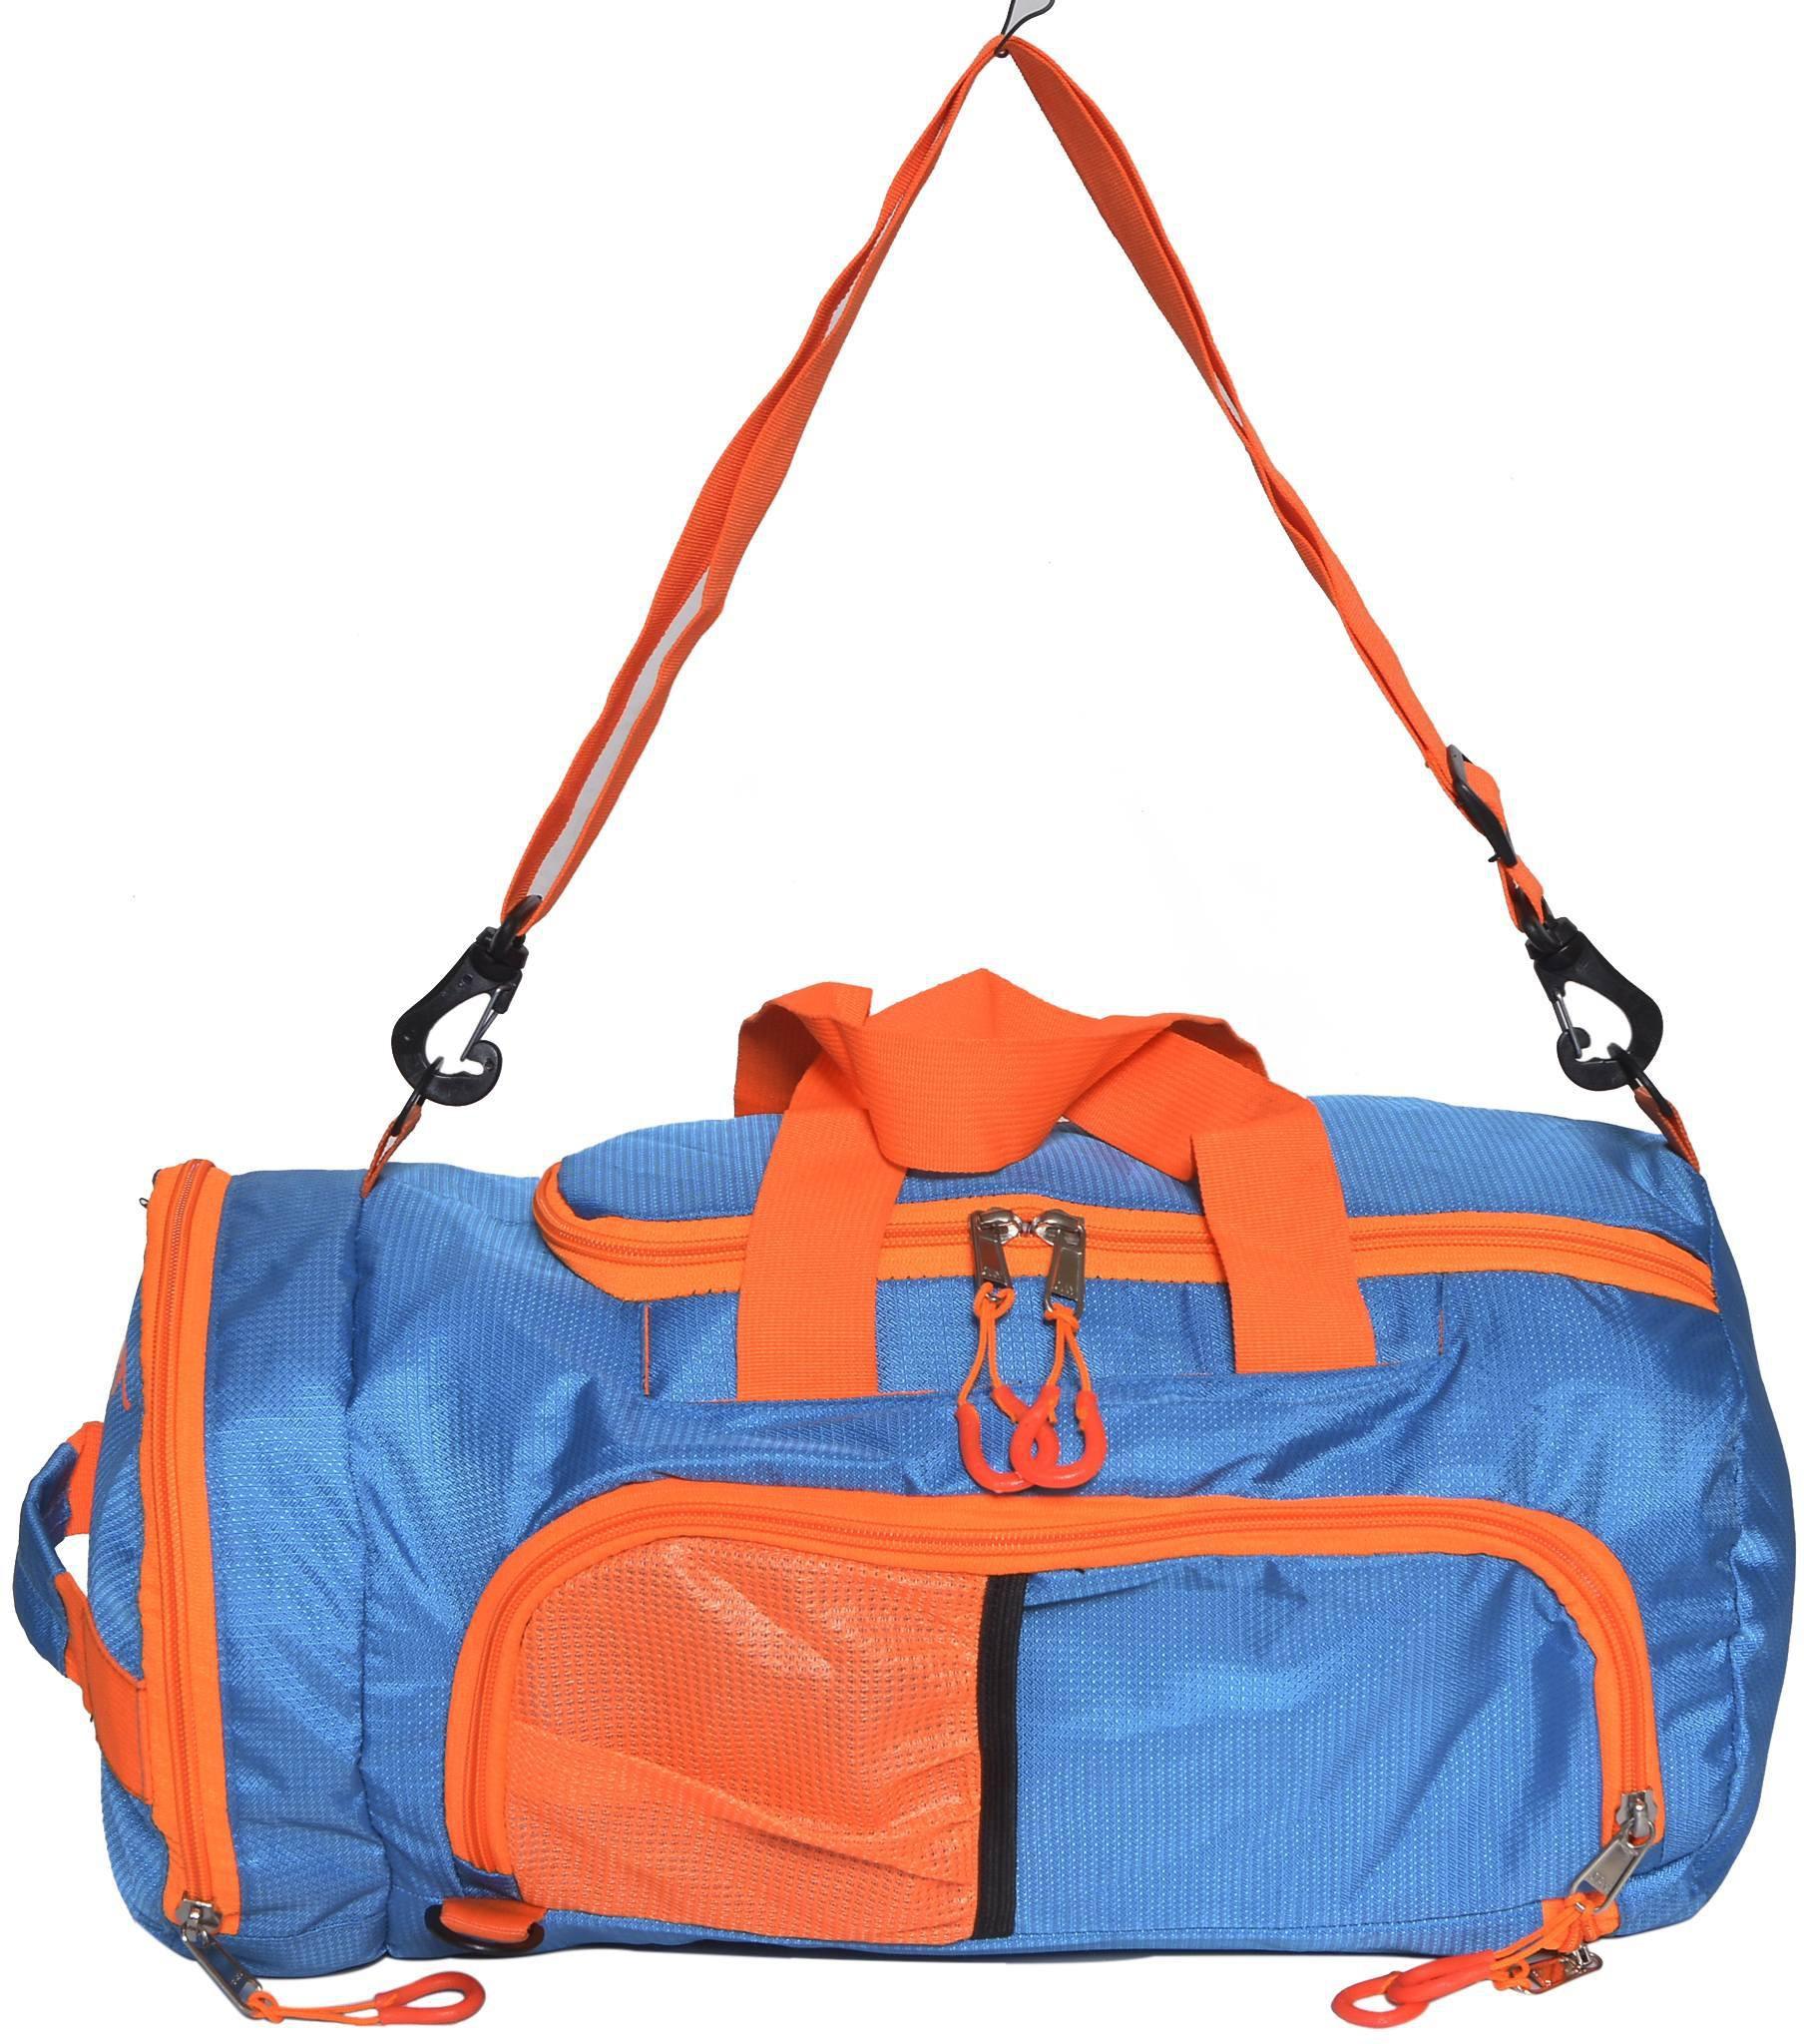 e4ee533d9a Gene MN-0304-BLUORG (Expandable) Travel Duffel Bag(Blue